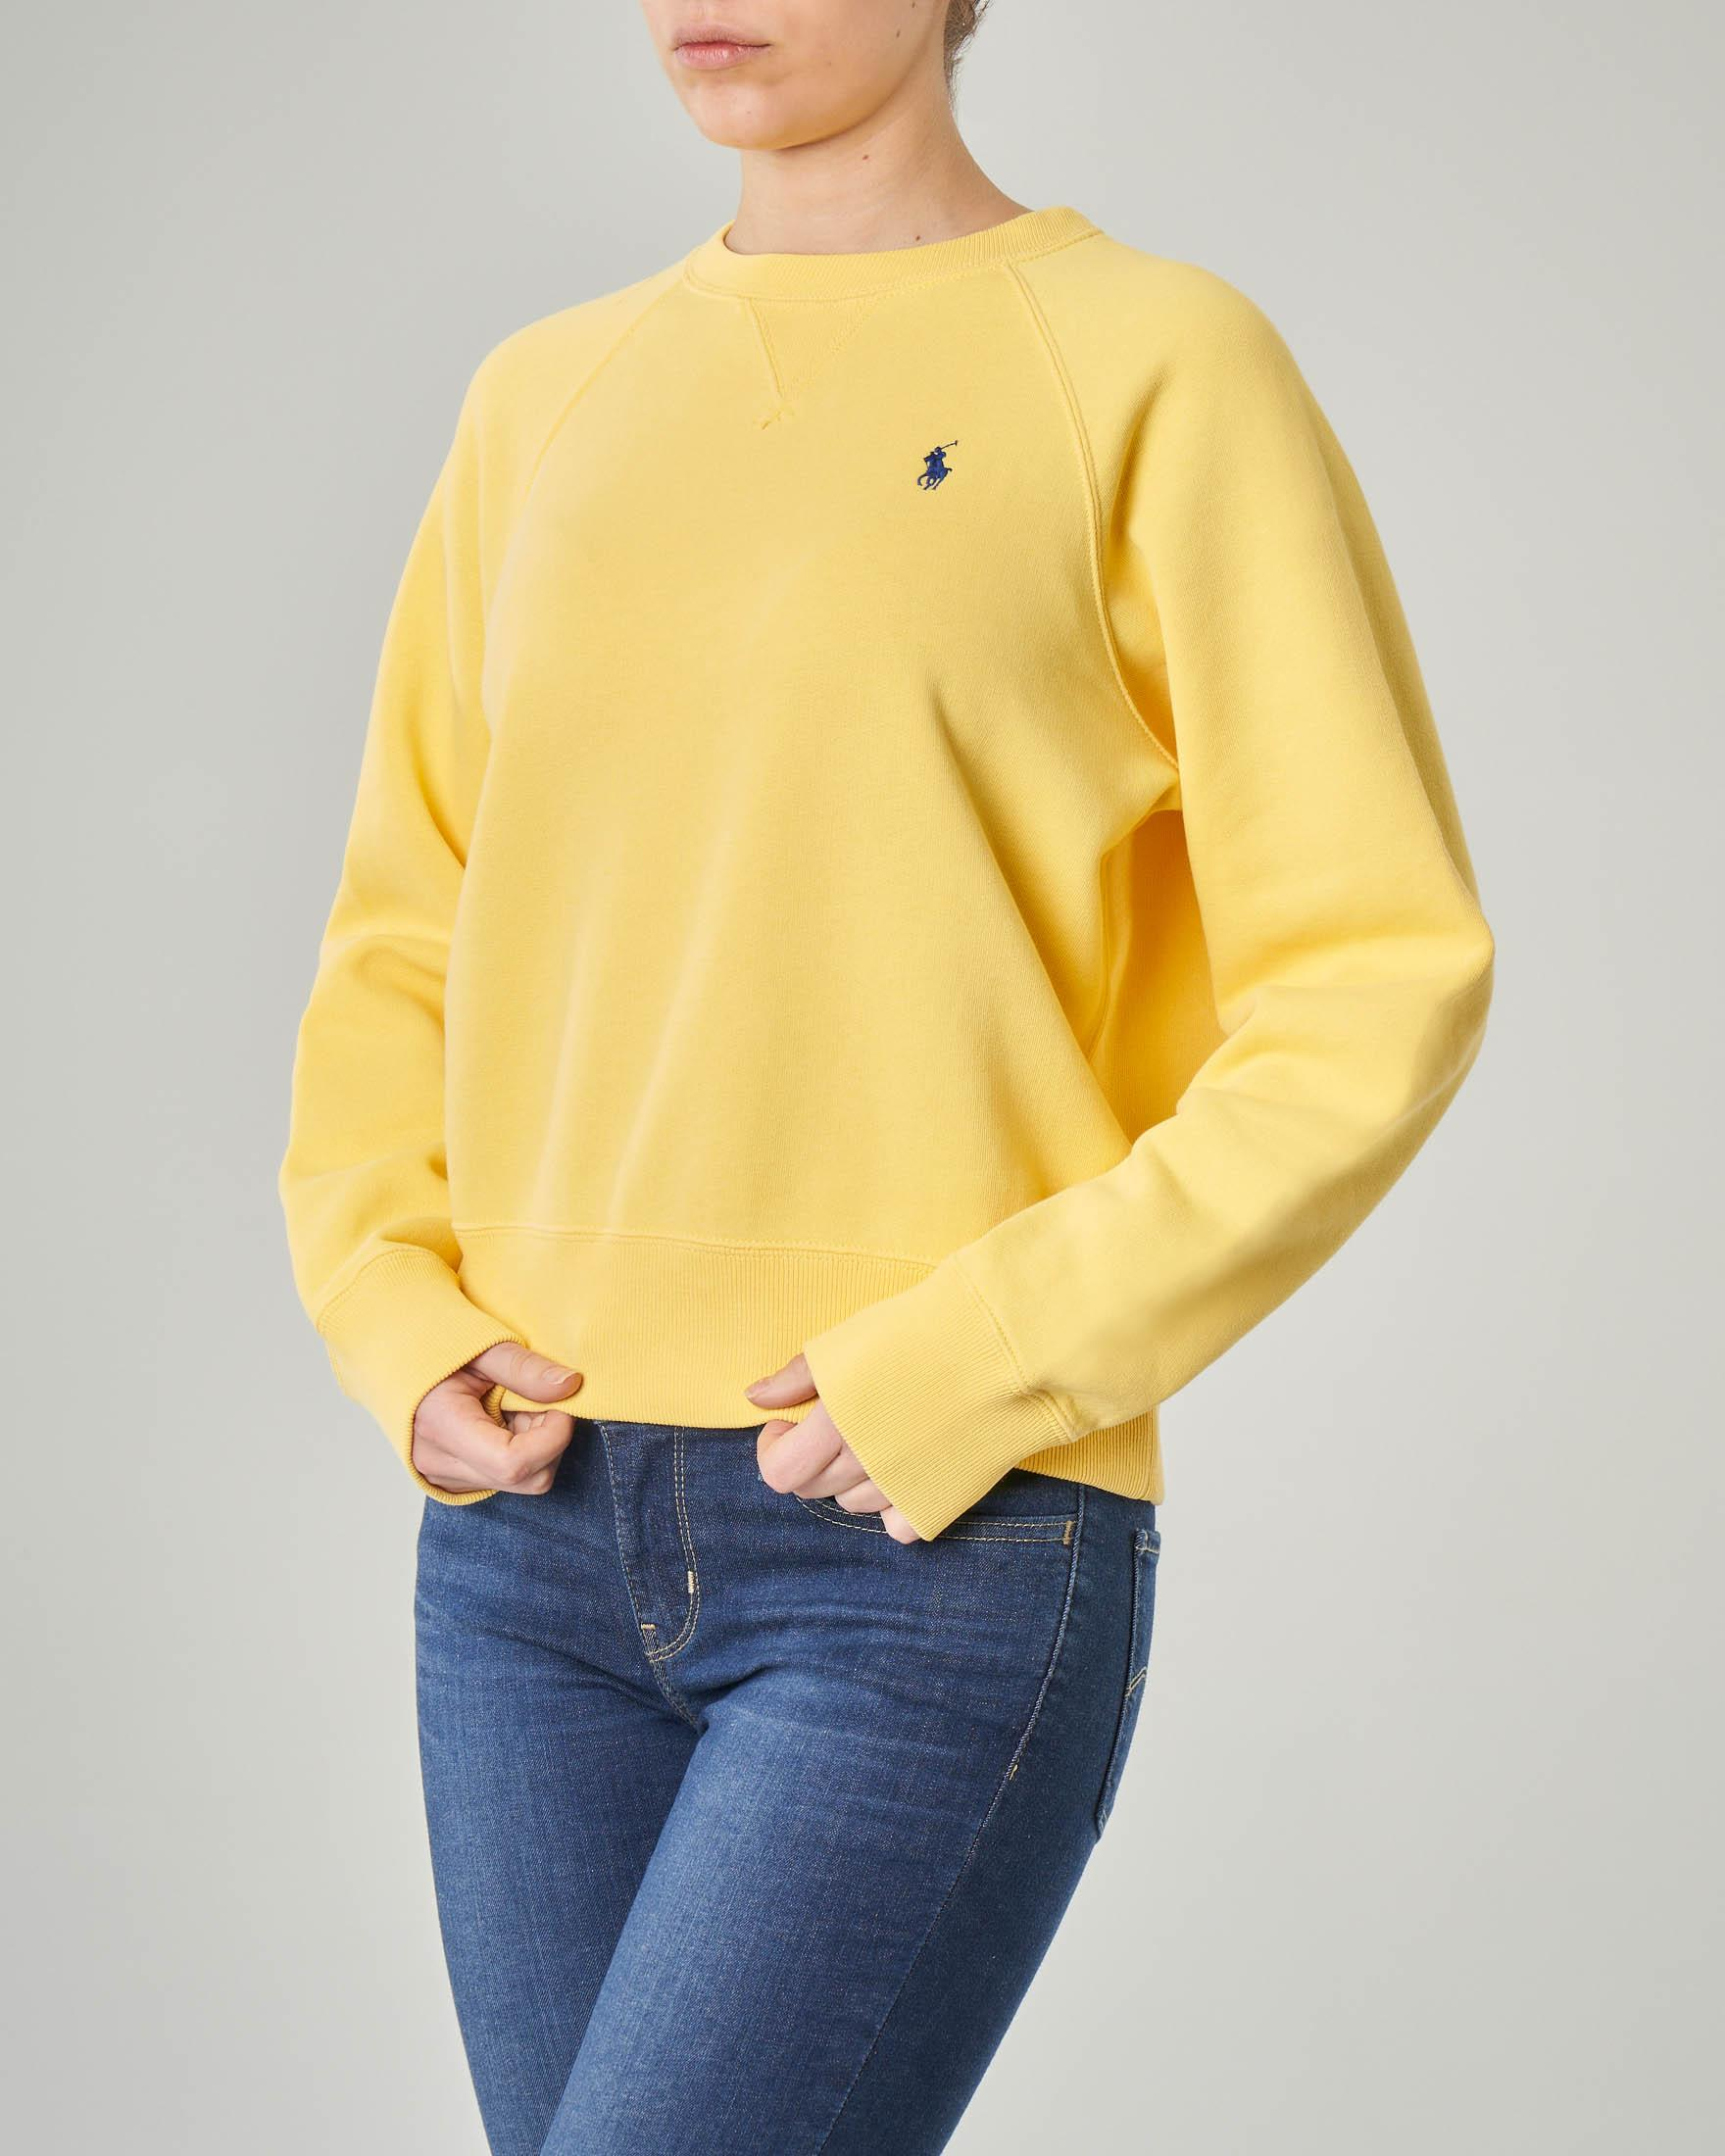 Felpa gialla girocollo in jersey di cotone